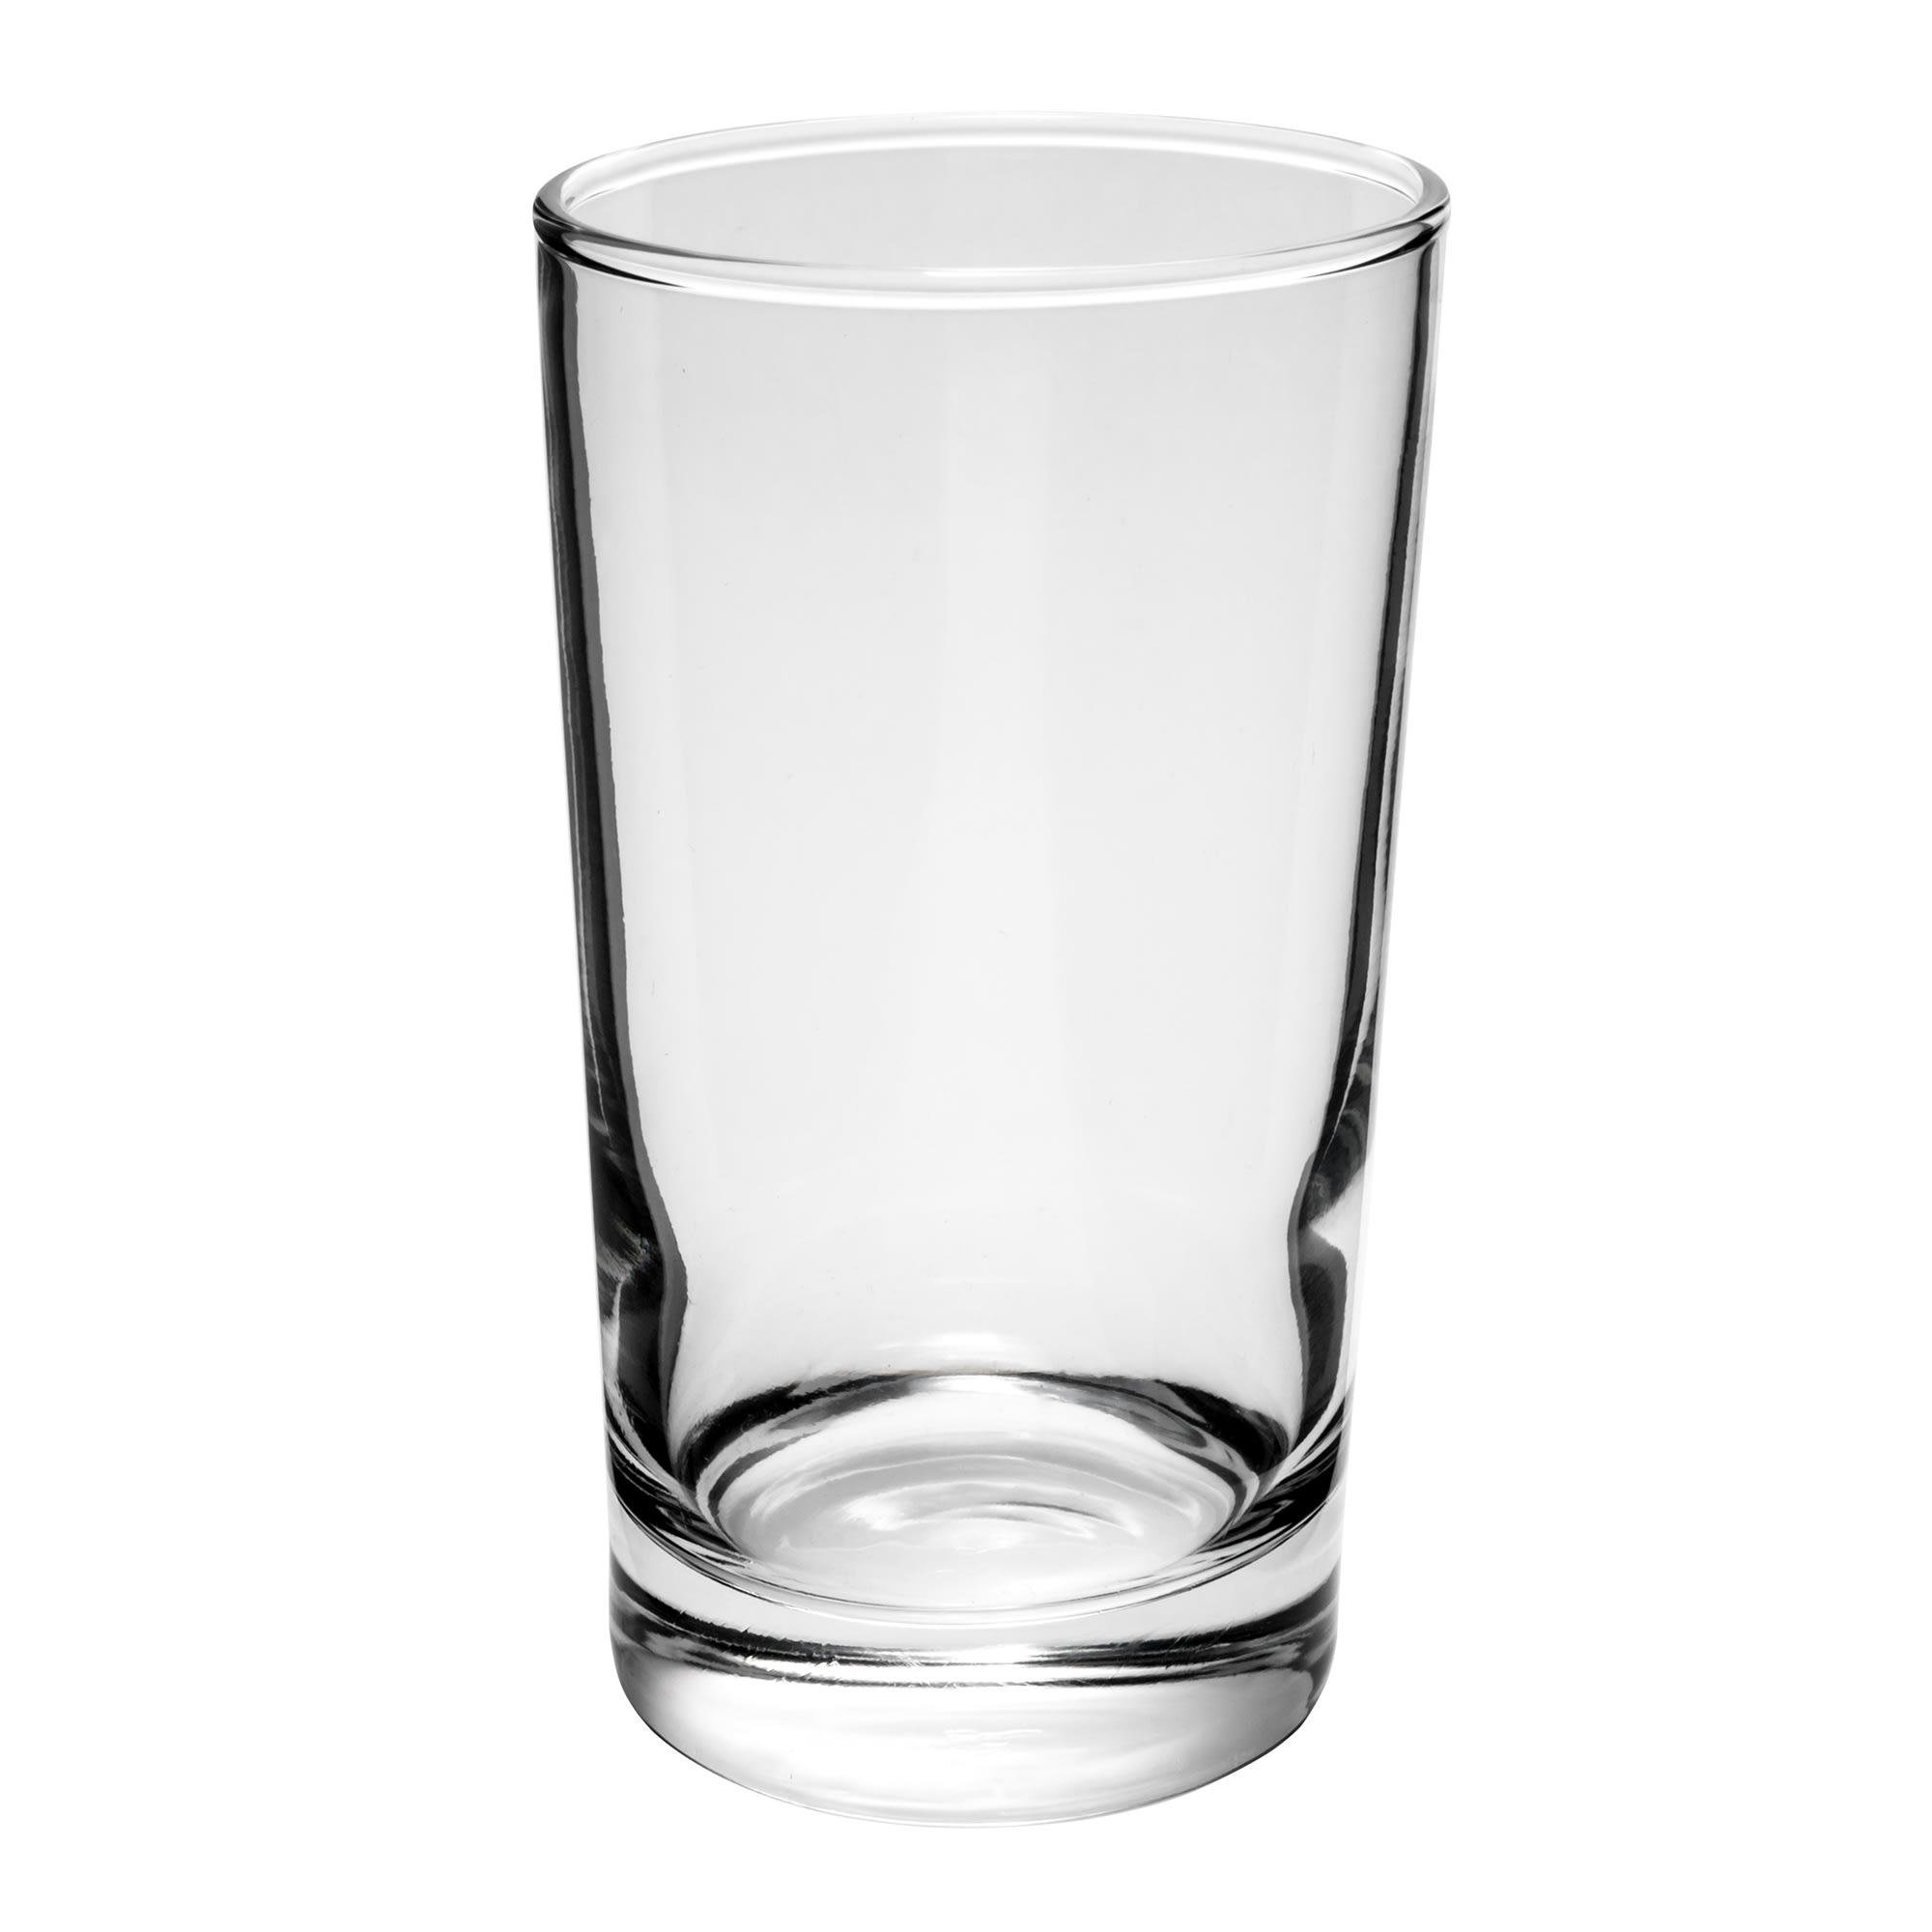 Libbey 123 7 oz Heavy Base Hi-Ball Glass - Safedge Rim Guarantee